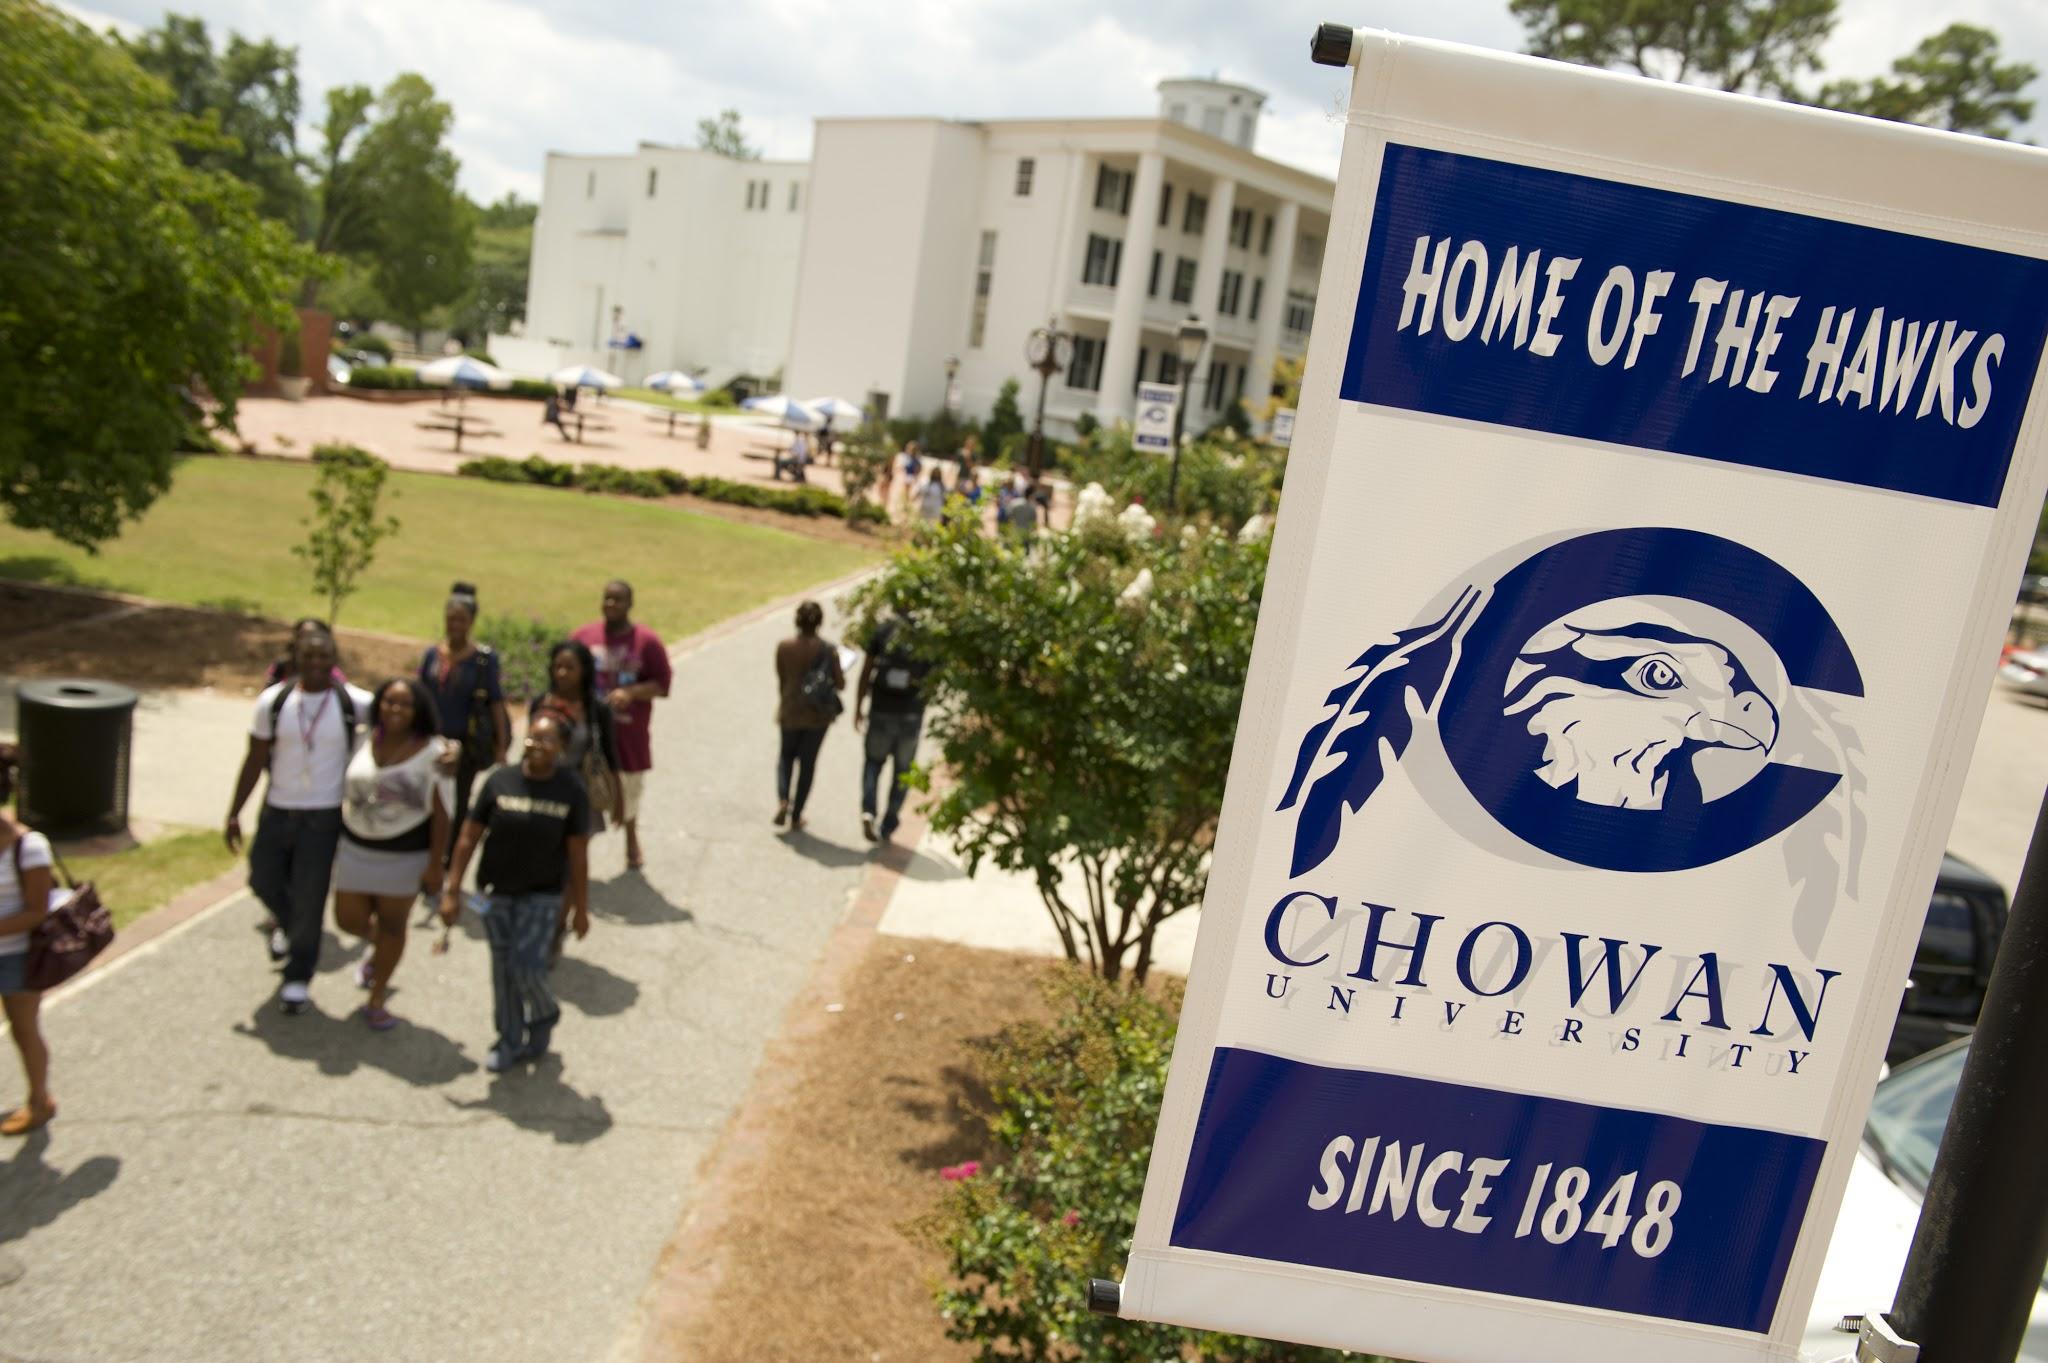 Chowan University Campus Map.Chowan University Google